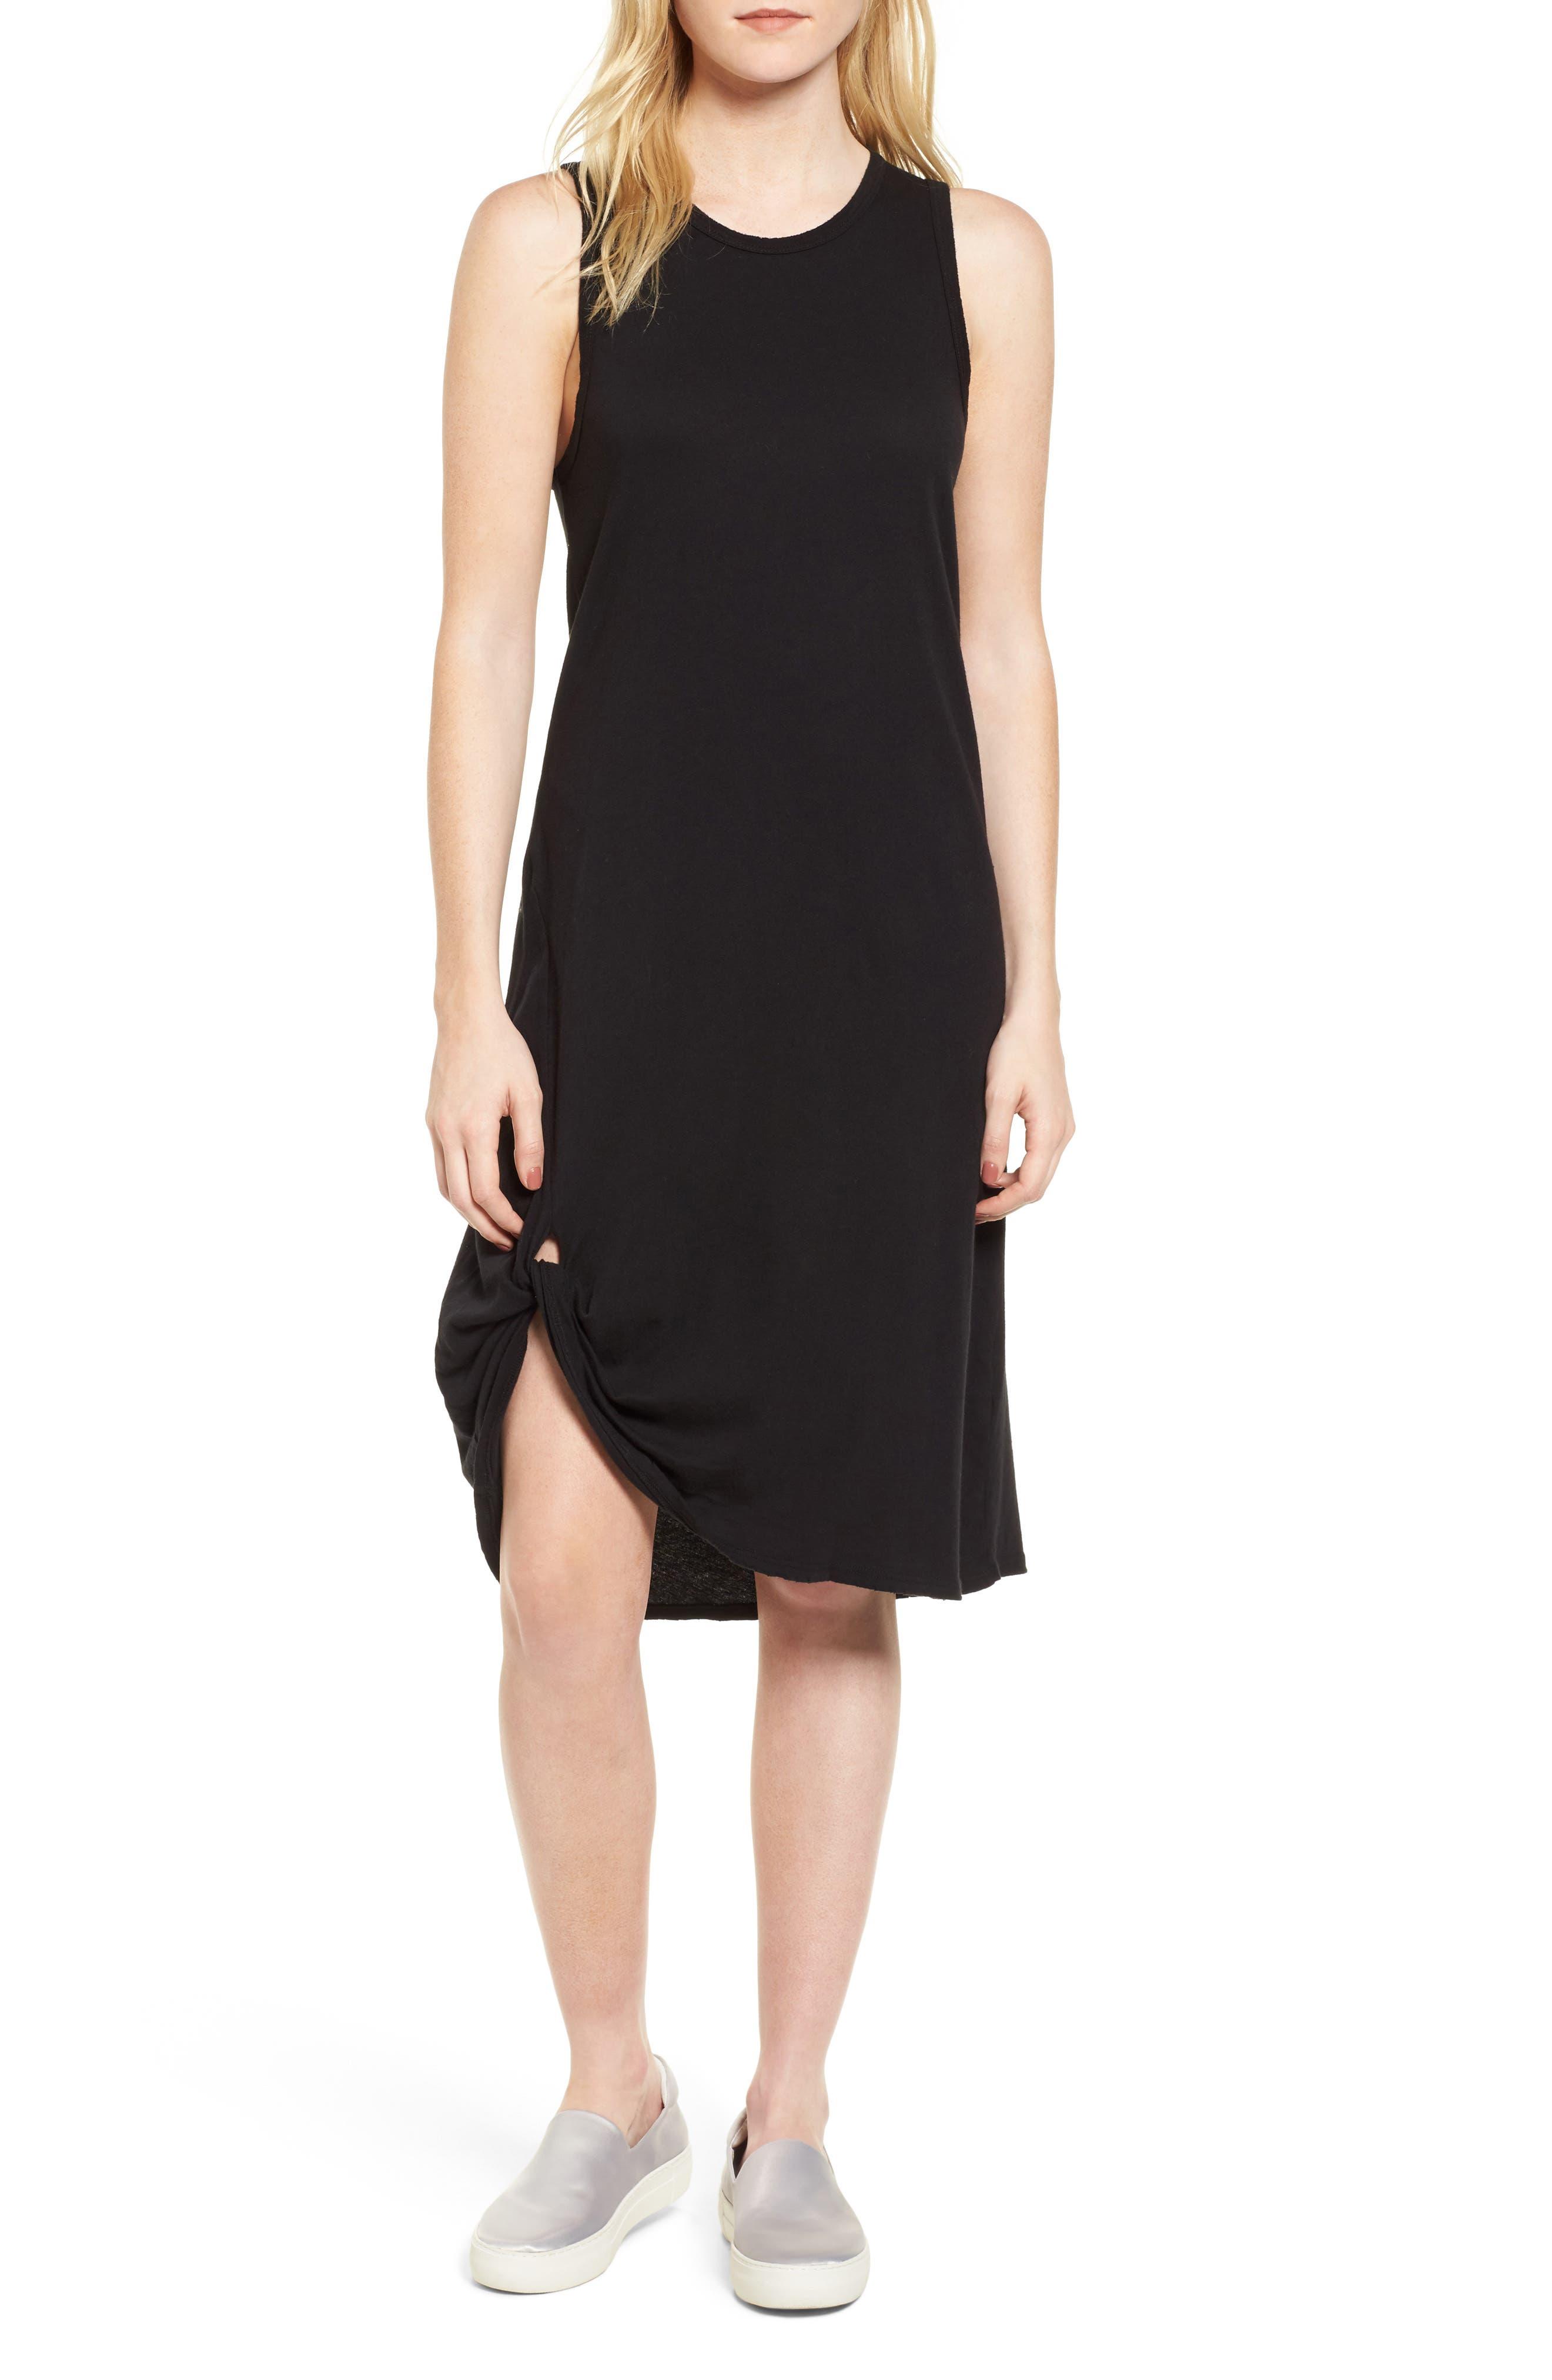 n:PHILANTHROPY Boo Jersey Tank Dress